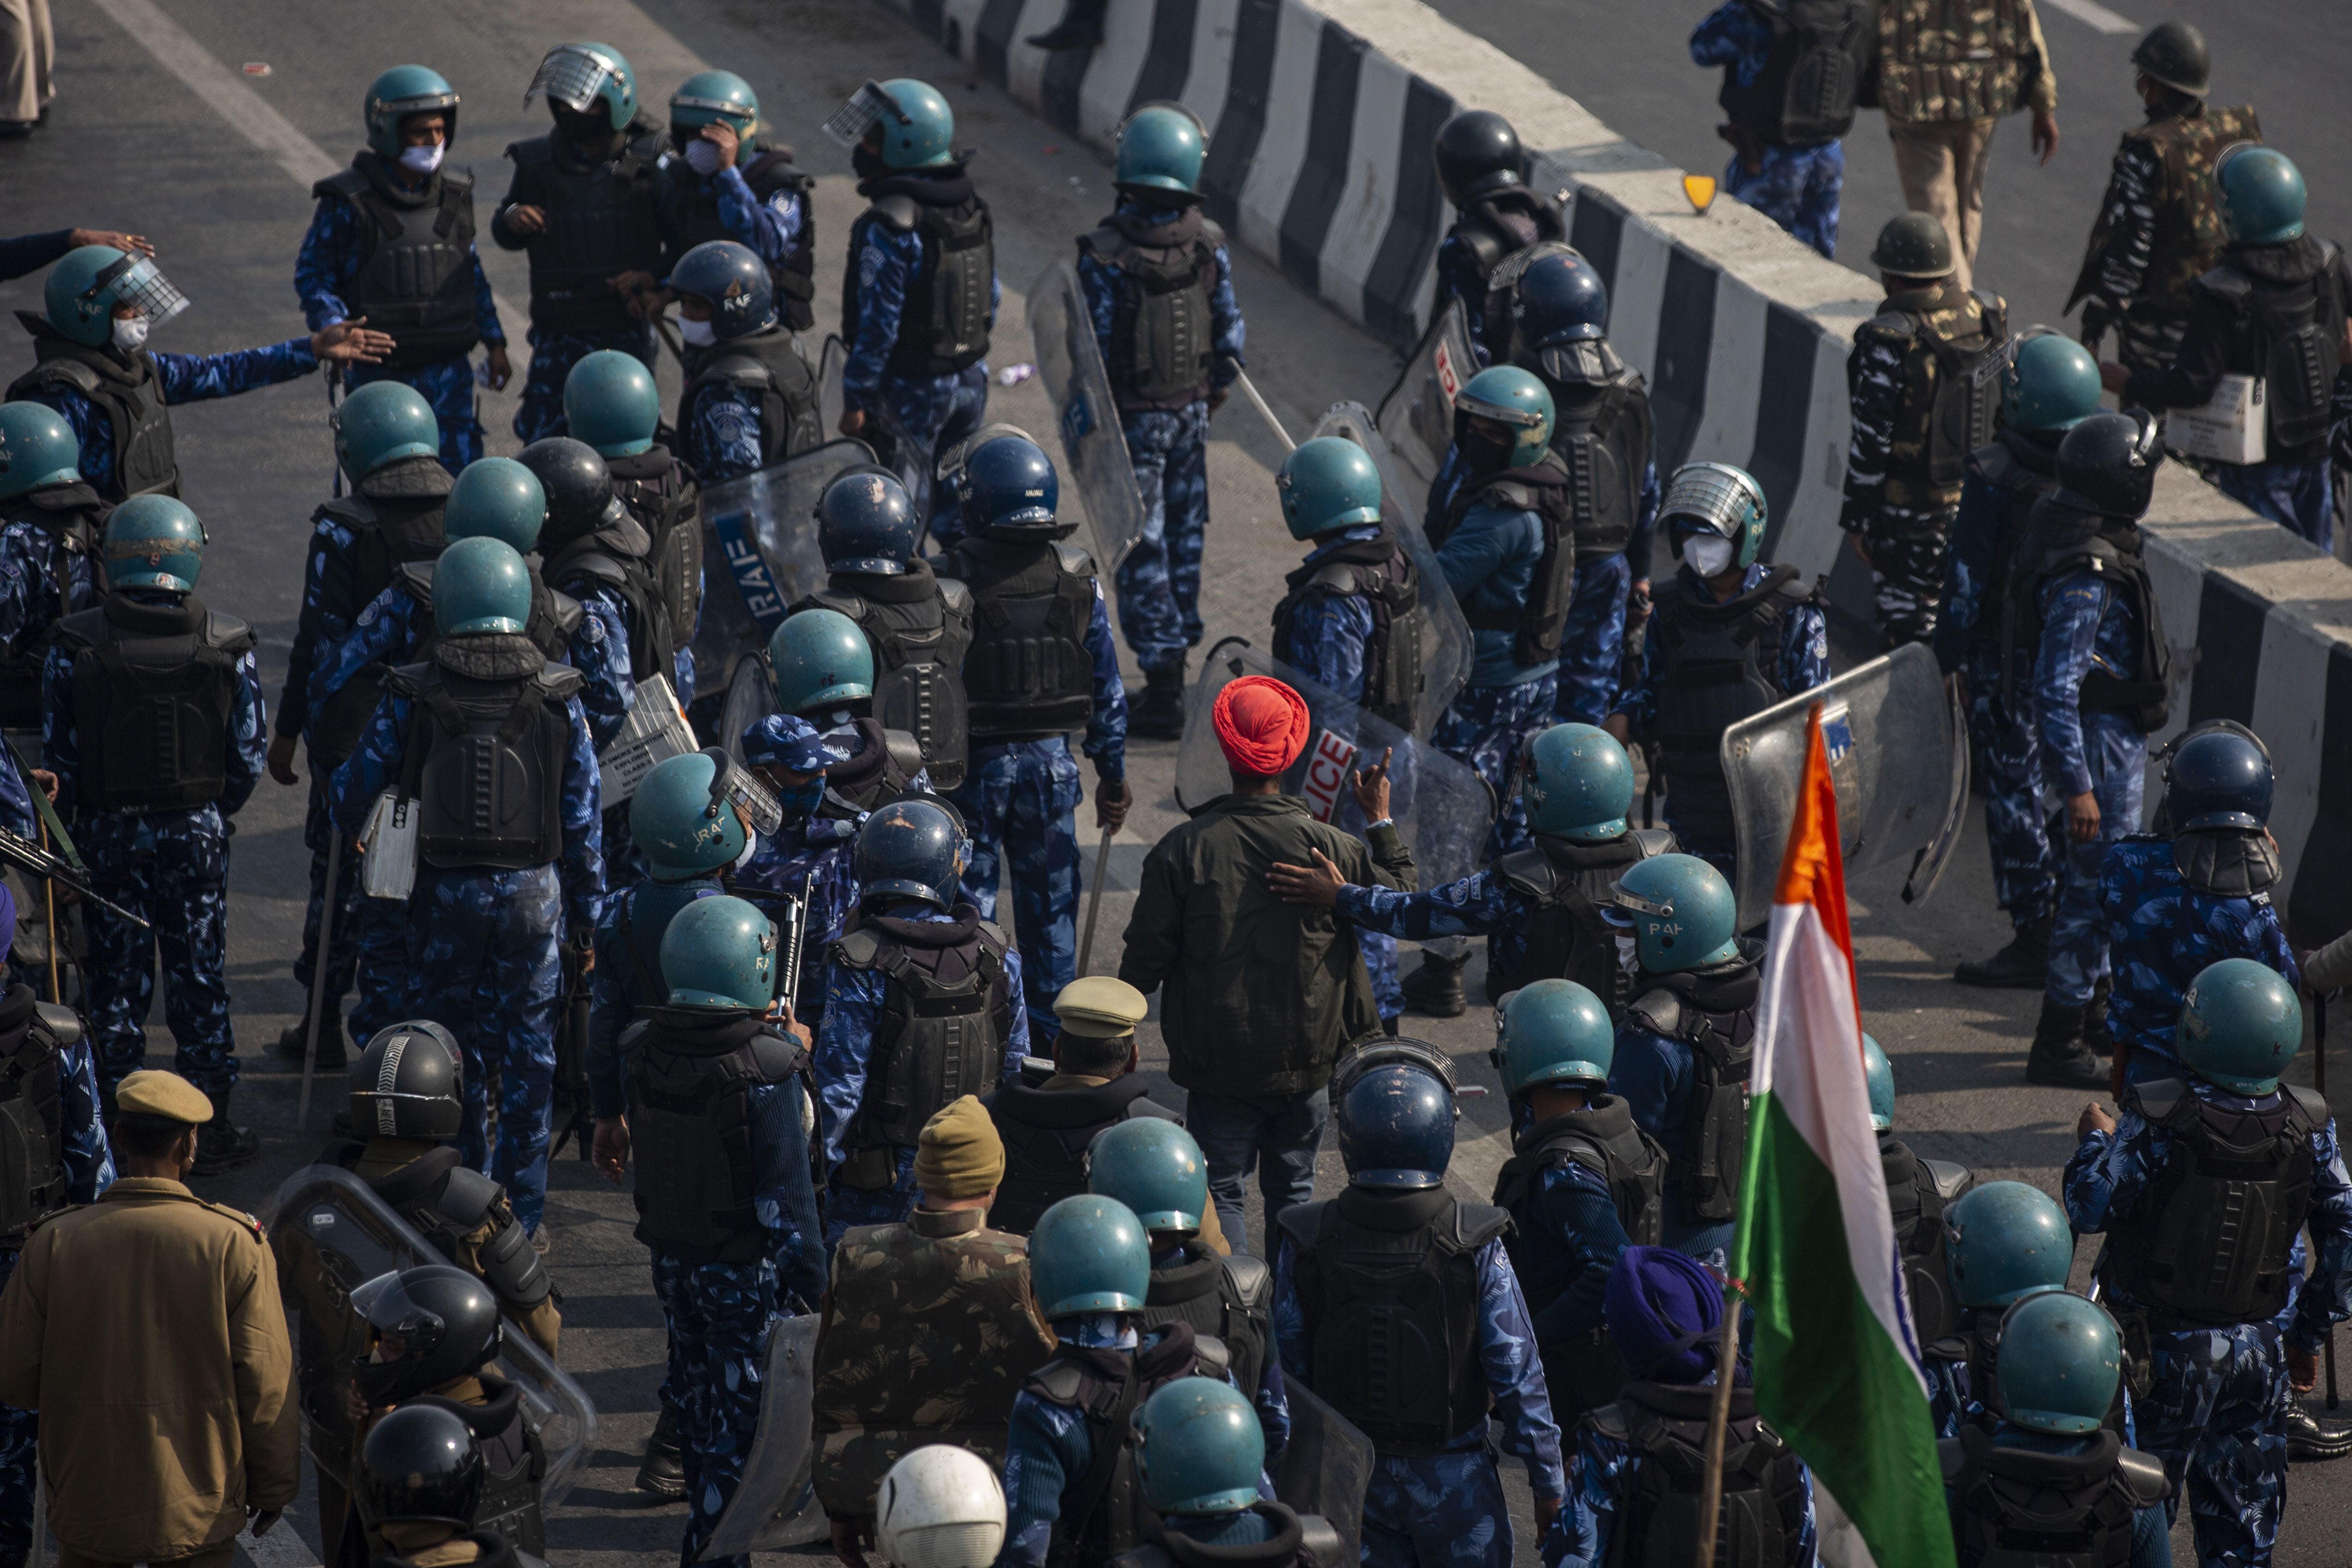 Heurts entre agriculteurs et policiers en Inde en marge de la fête nationale